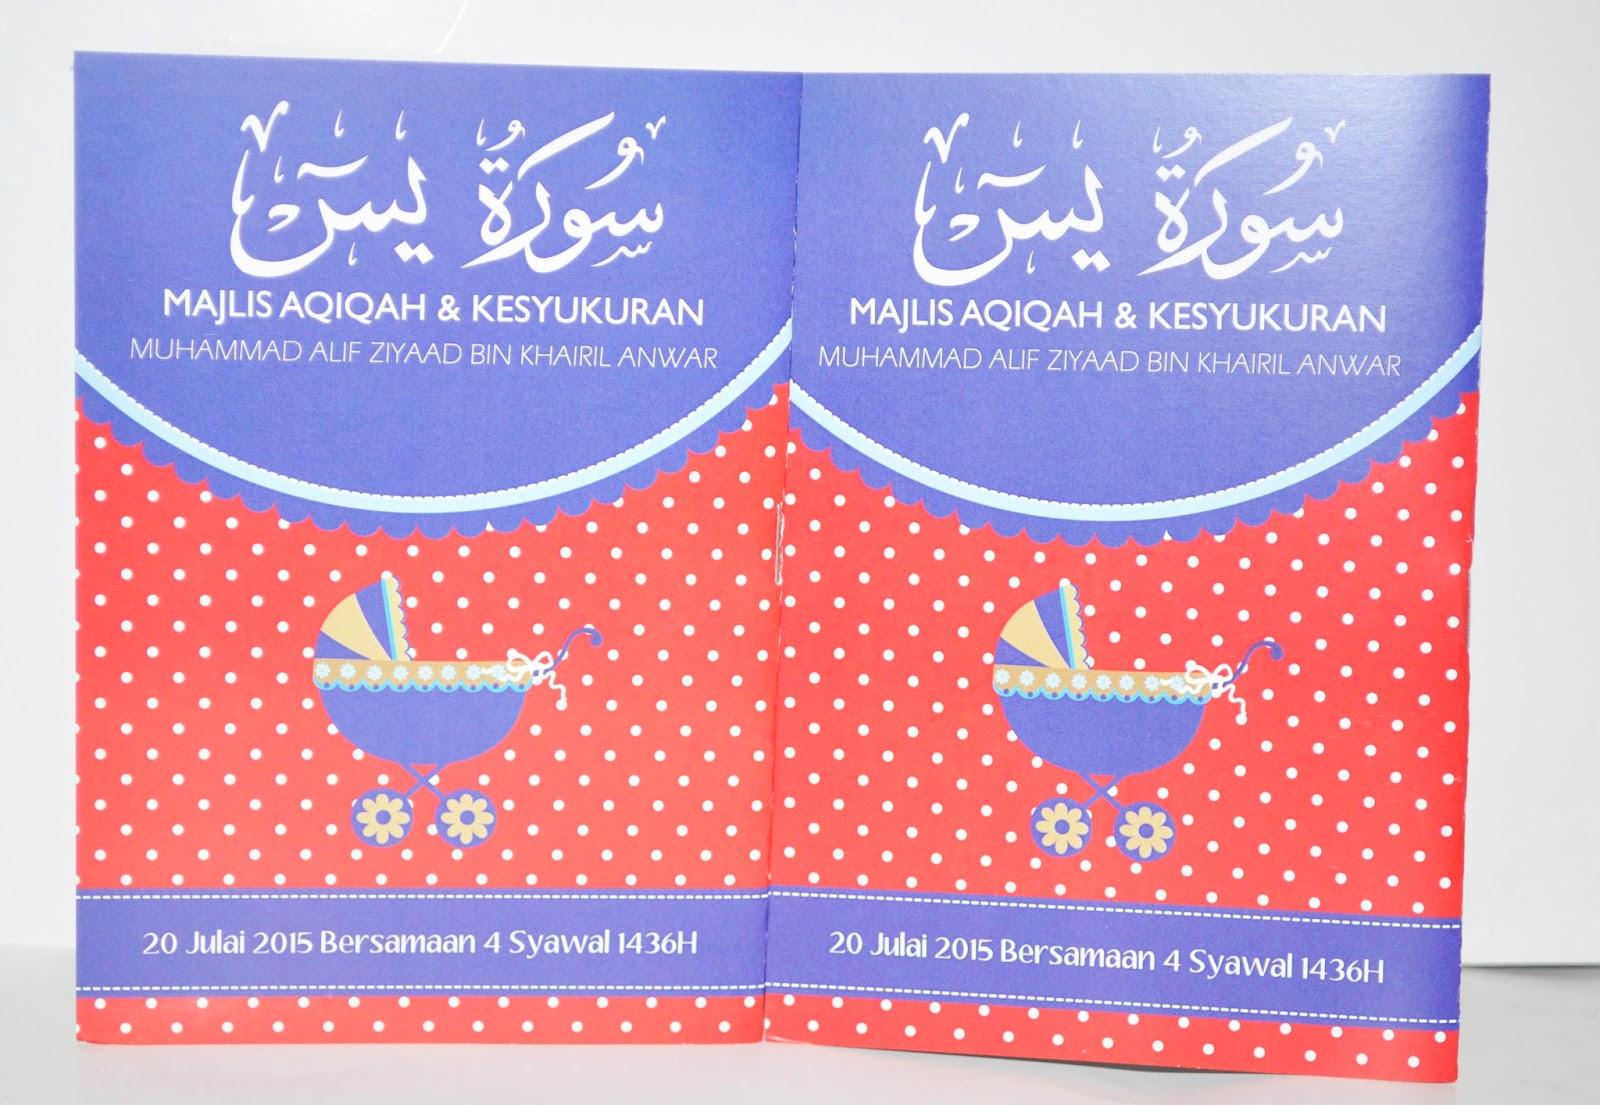 PERSONALISED/CUSTOM COVER YASIN UNTUK MAJLIS AQIQAH DAN